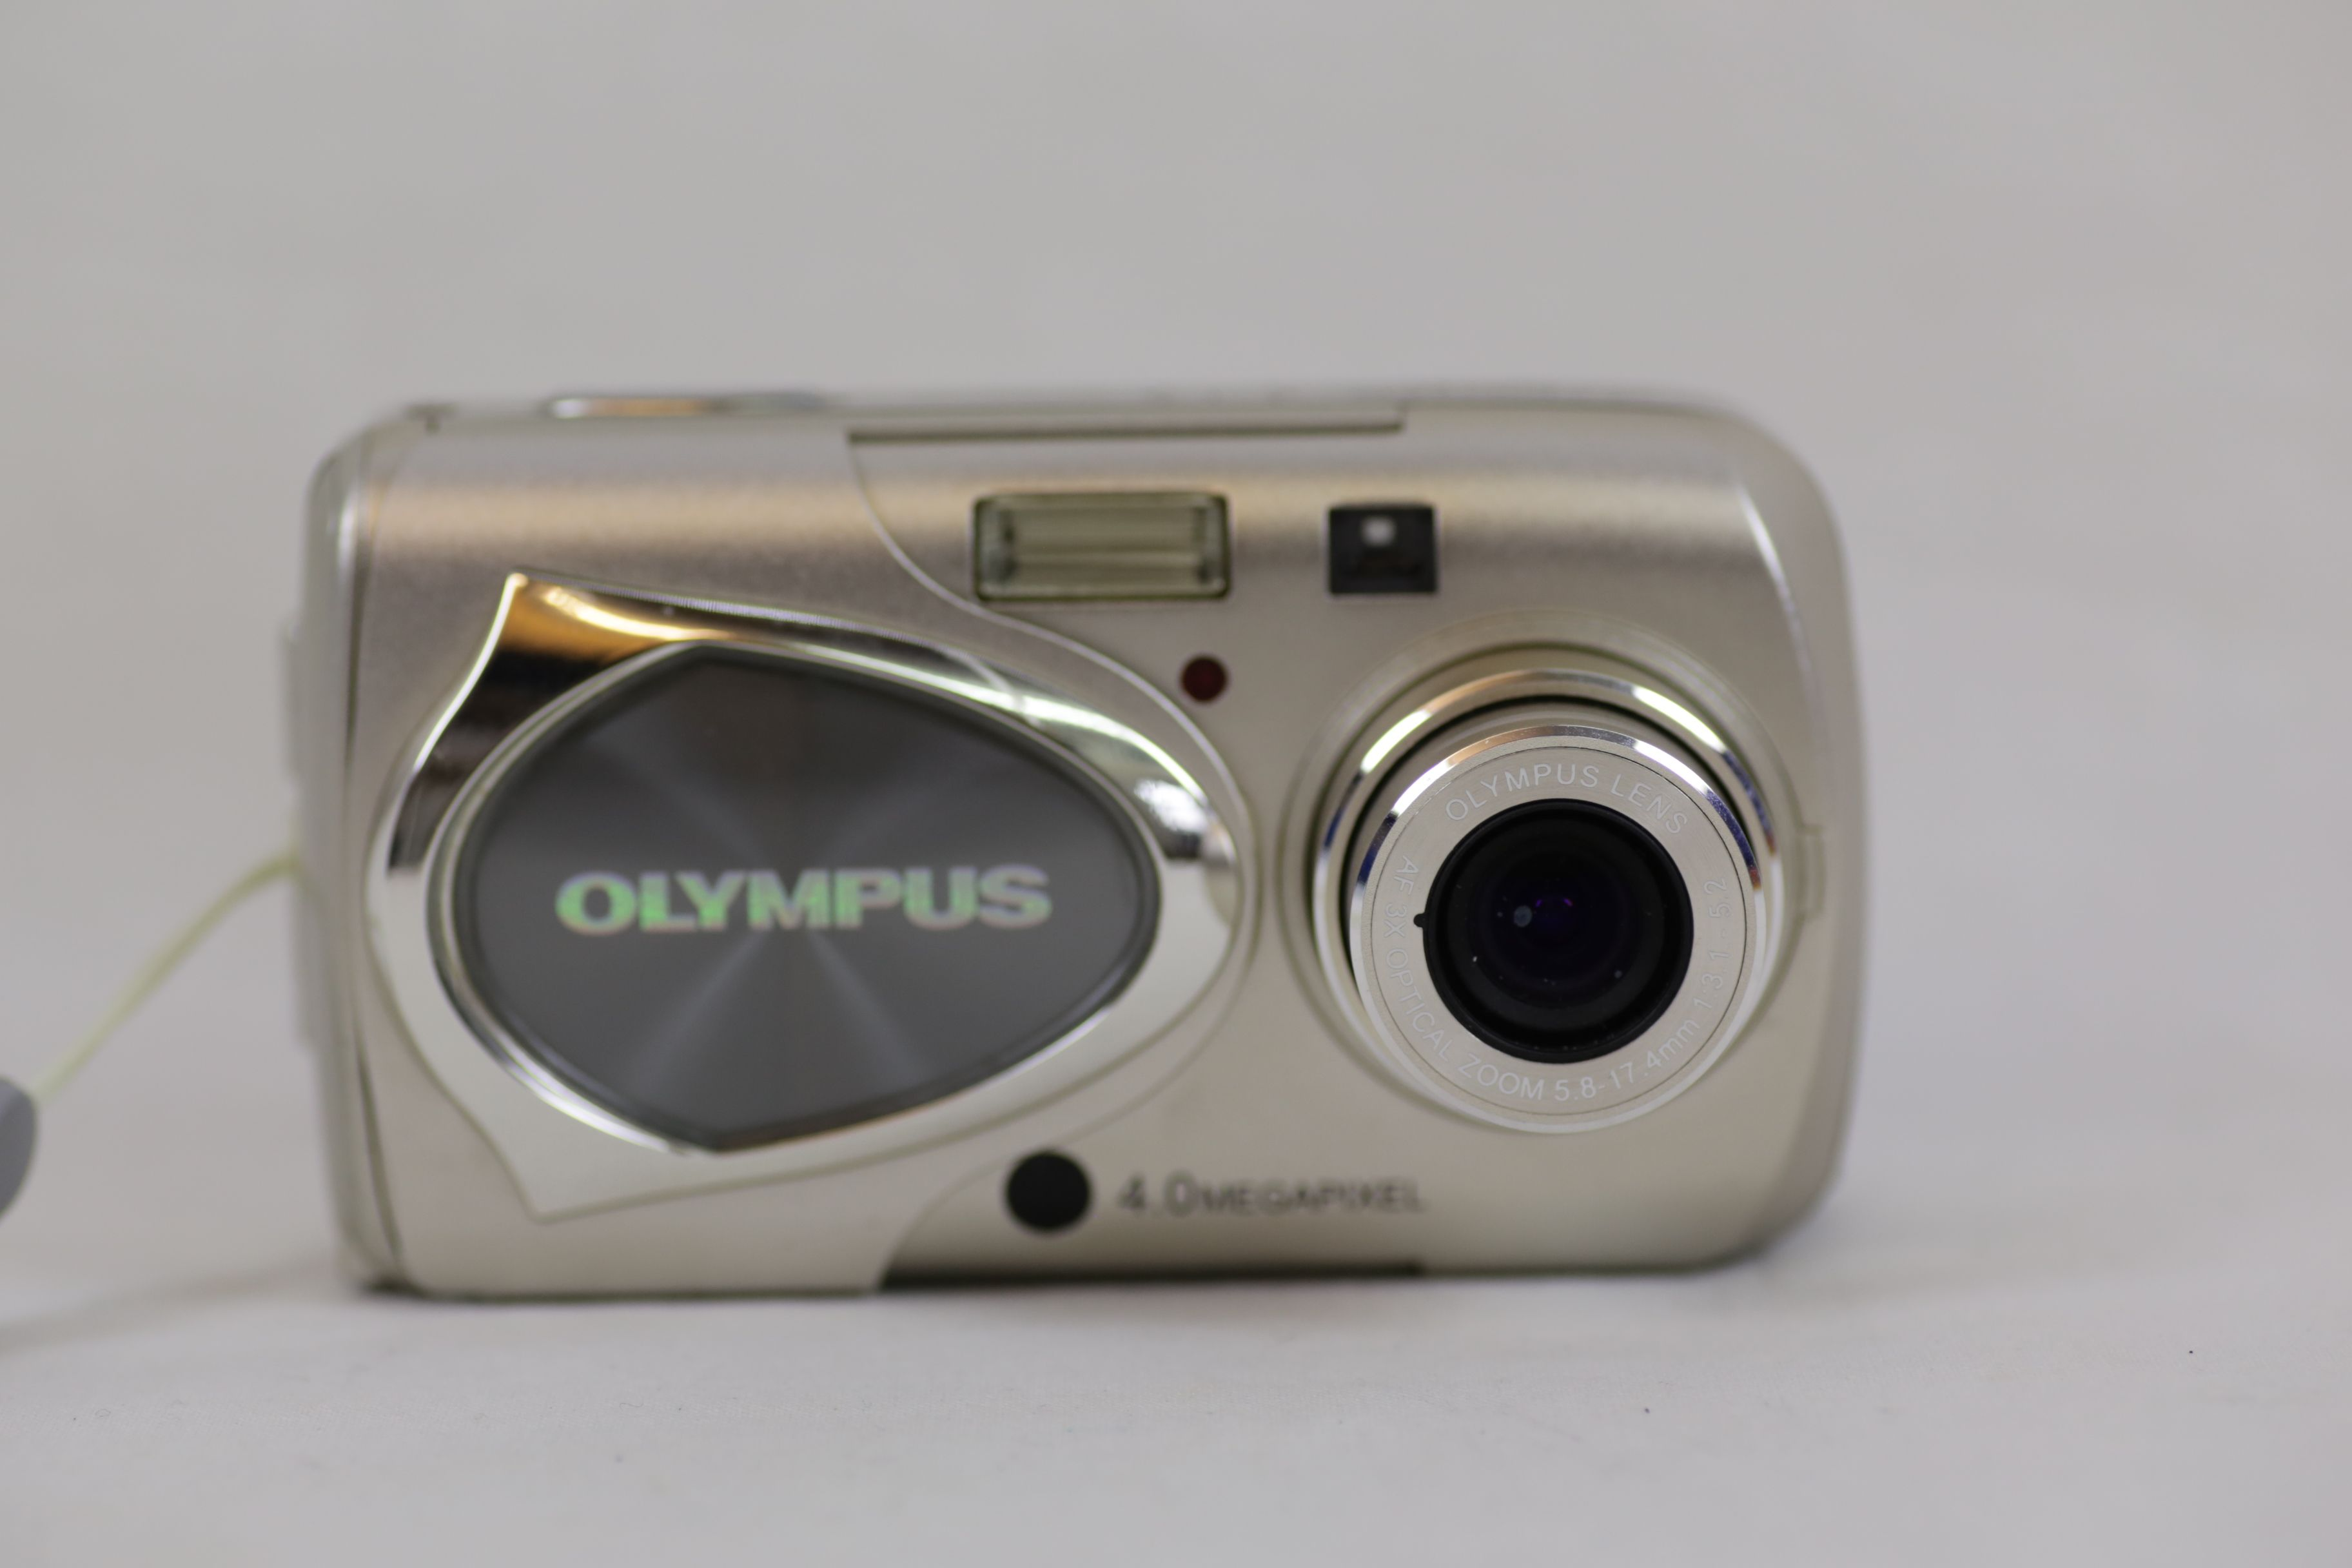 olympus mju 410 u410 digital 4 0mp all weather digital camera rh arhc callcut net Olympus Mju 9000 Olympus Mju Tough